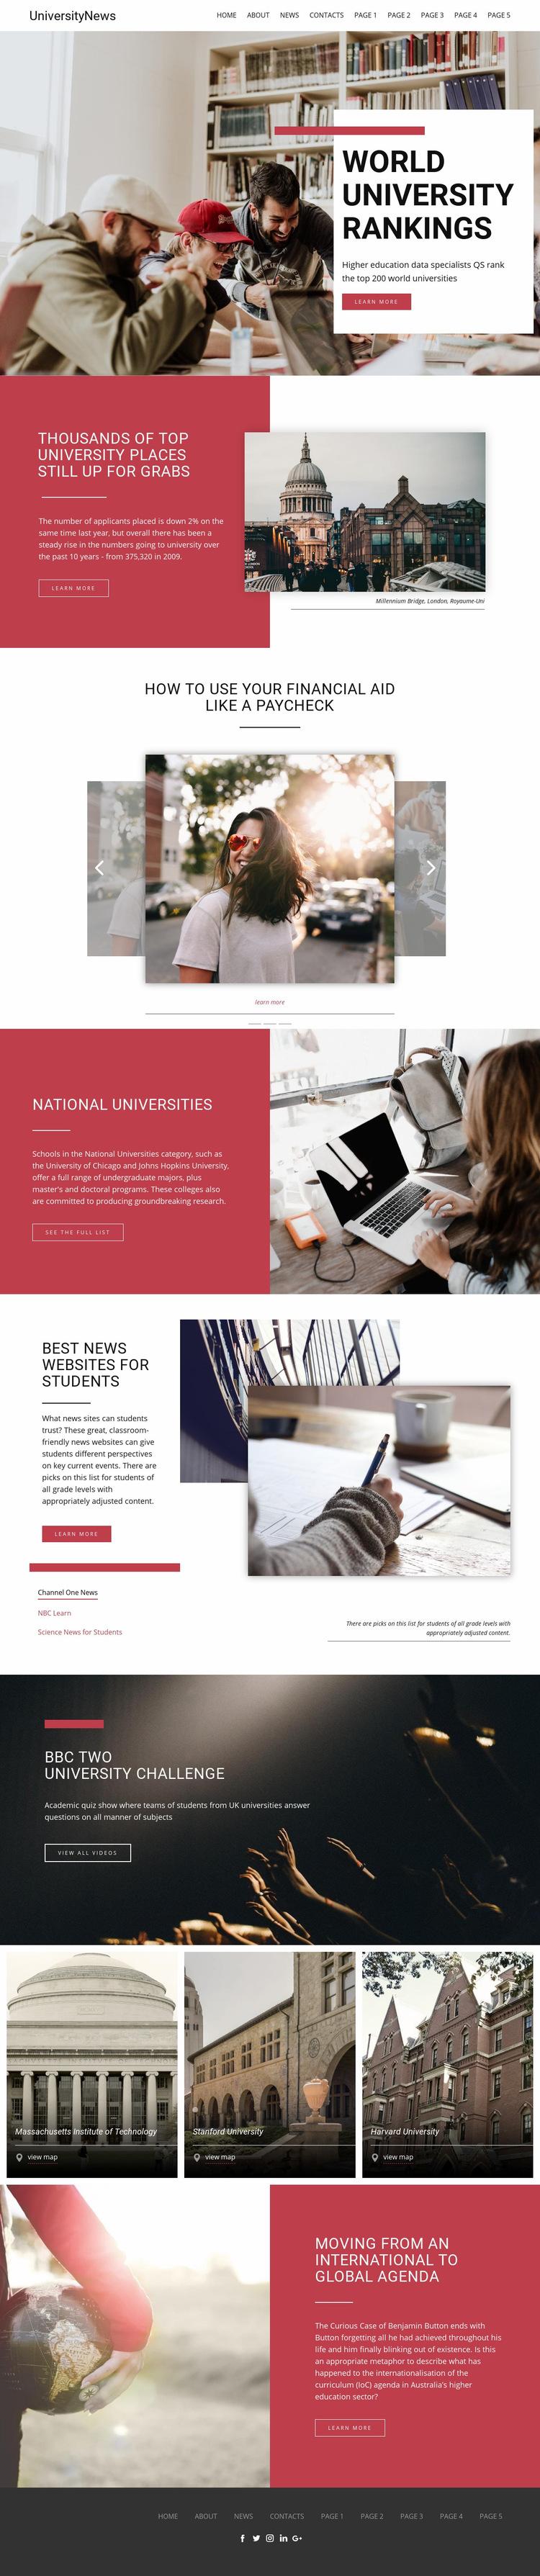 Ranking university education Web Page Design